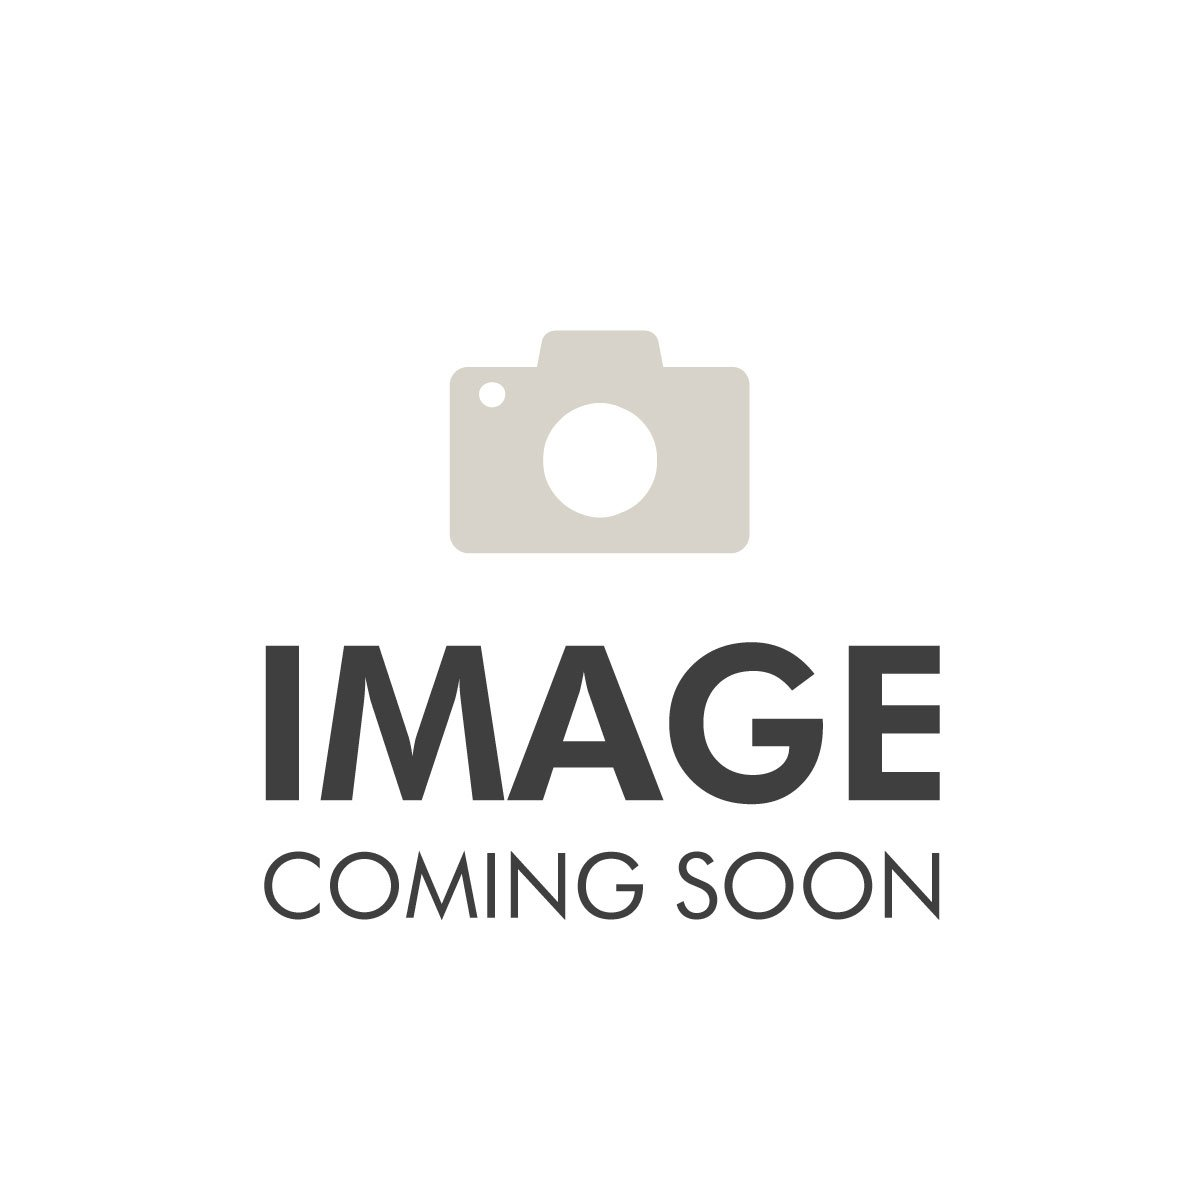 Leon Paul - Coquille de fleuret - Ultra-léger